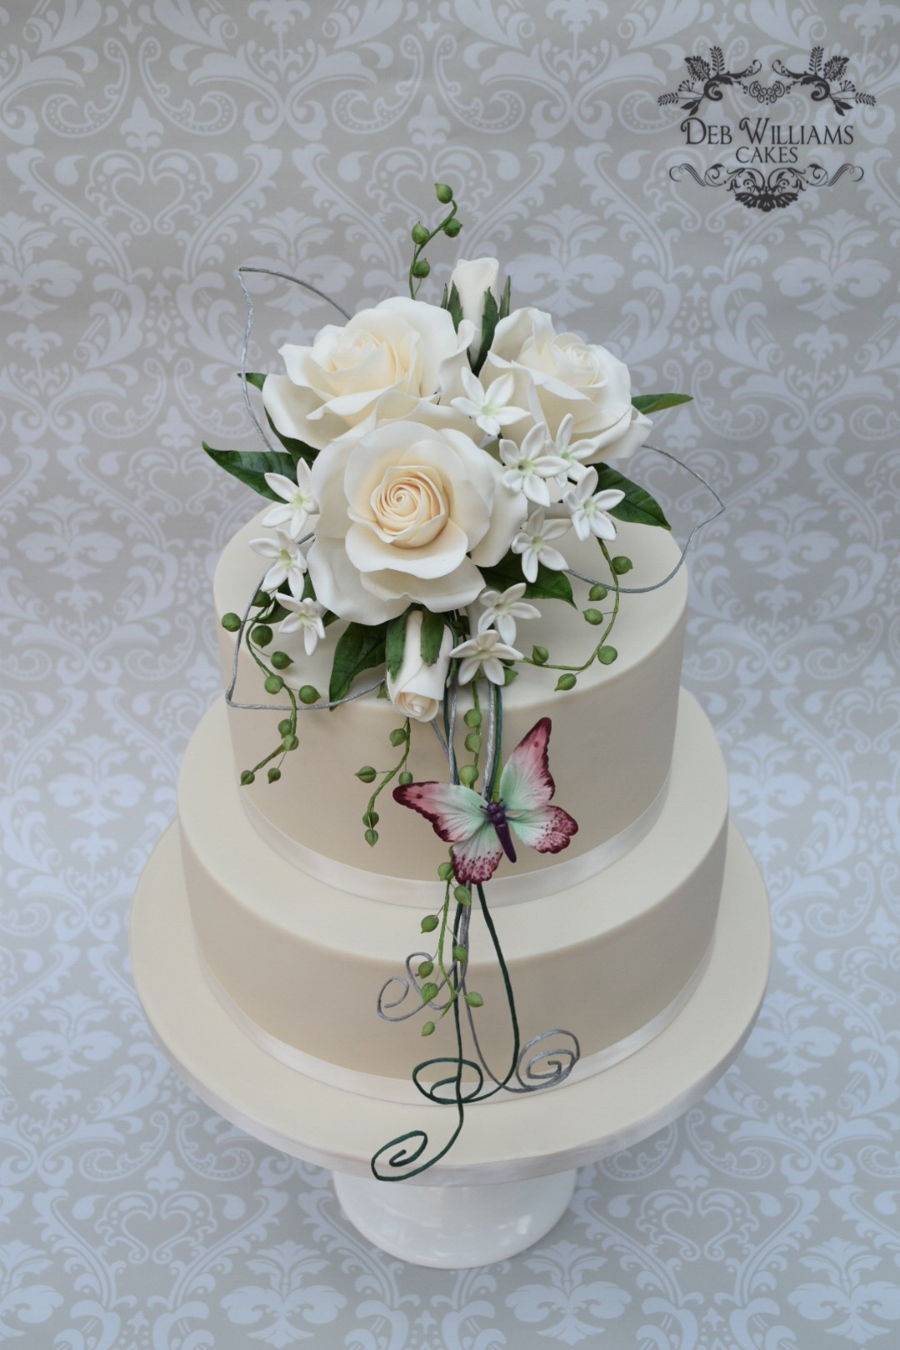 Sugar Flowers For Wedding Cakes  Sugar Flowers Wedding Cake CakeCentral